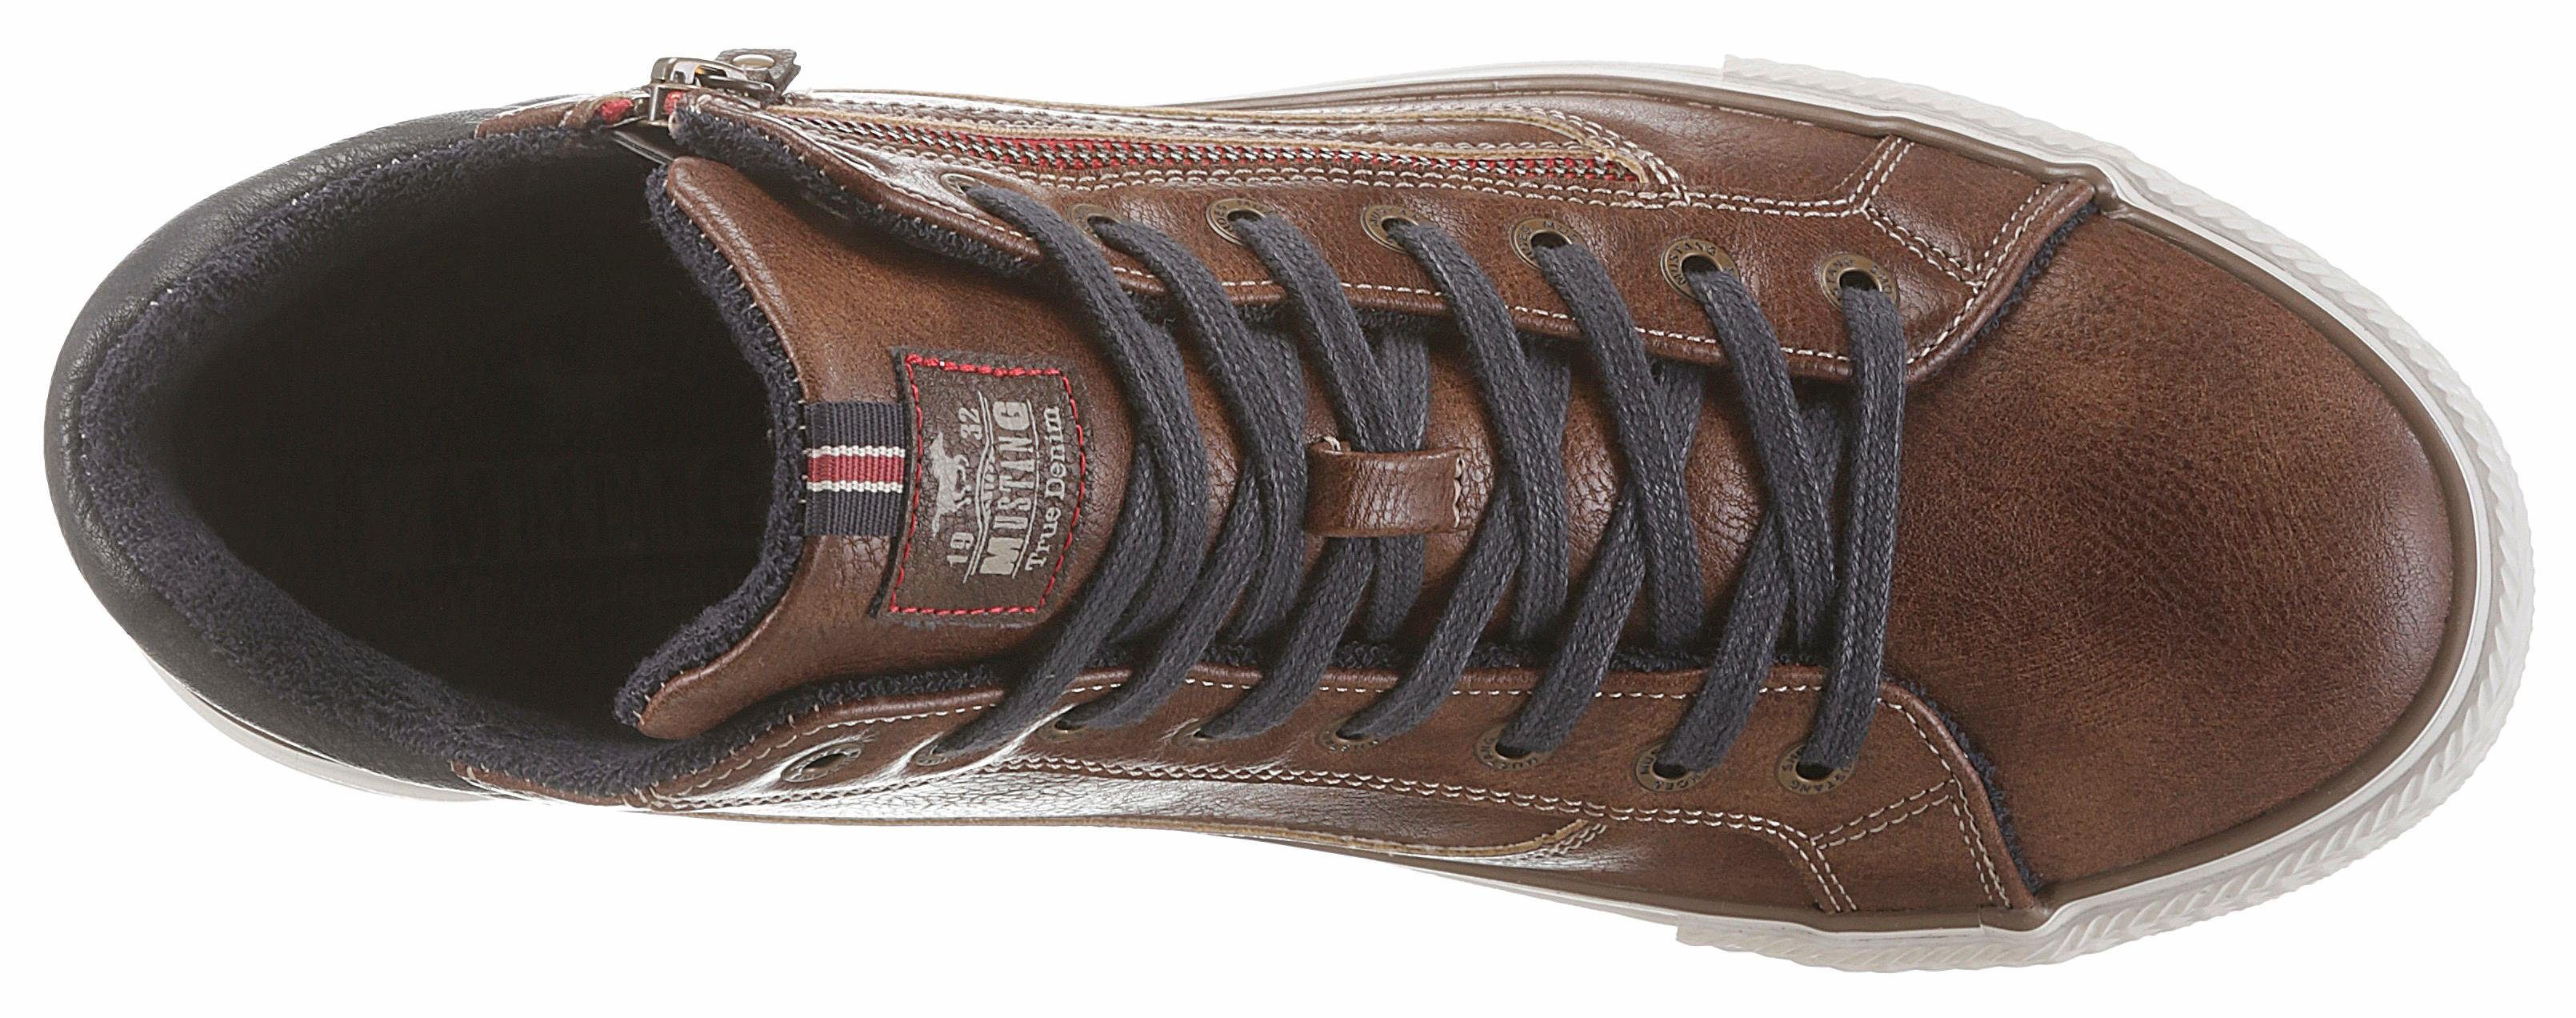 Mustang Shoes Sneaker online kaufen  braun